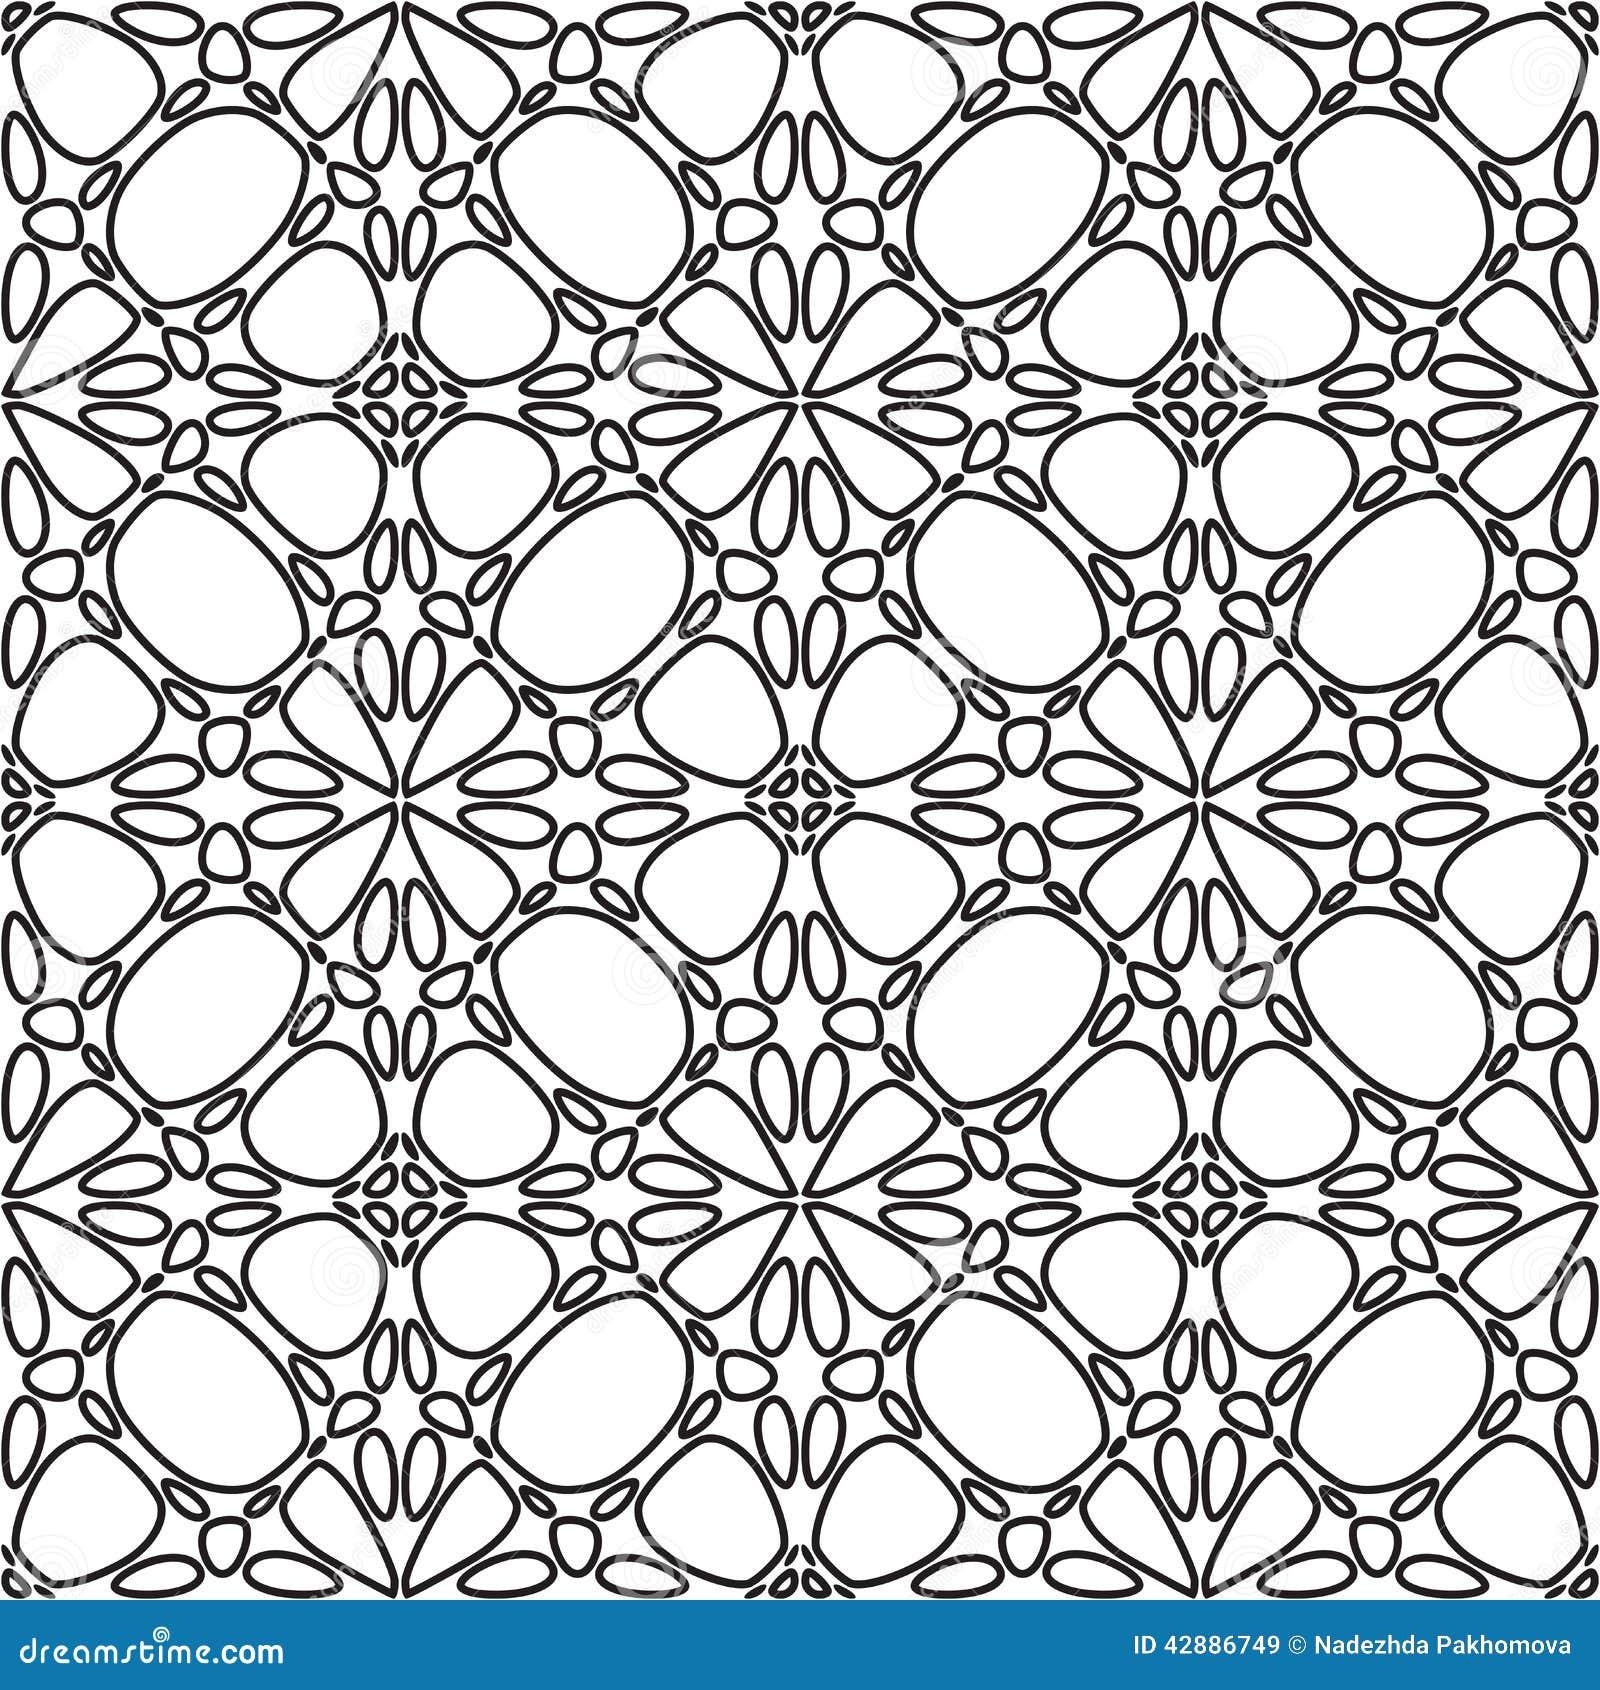 Flores Abstratas Para Colorir Ilustracao Do Vetor Ilustracao De